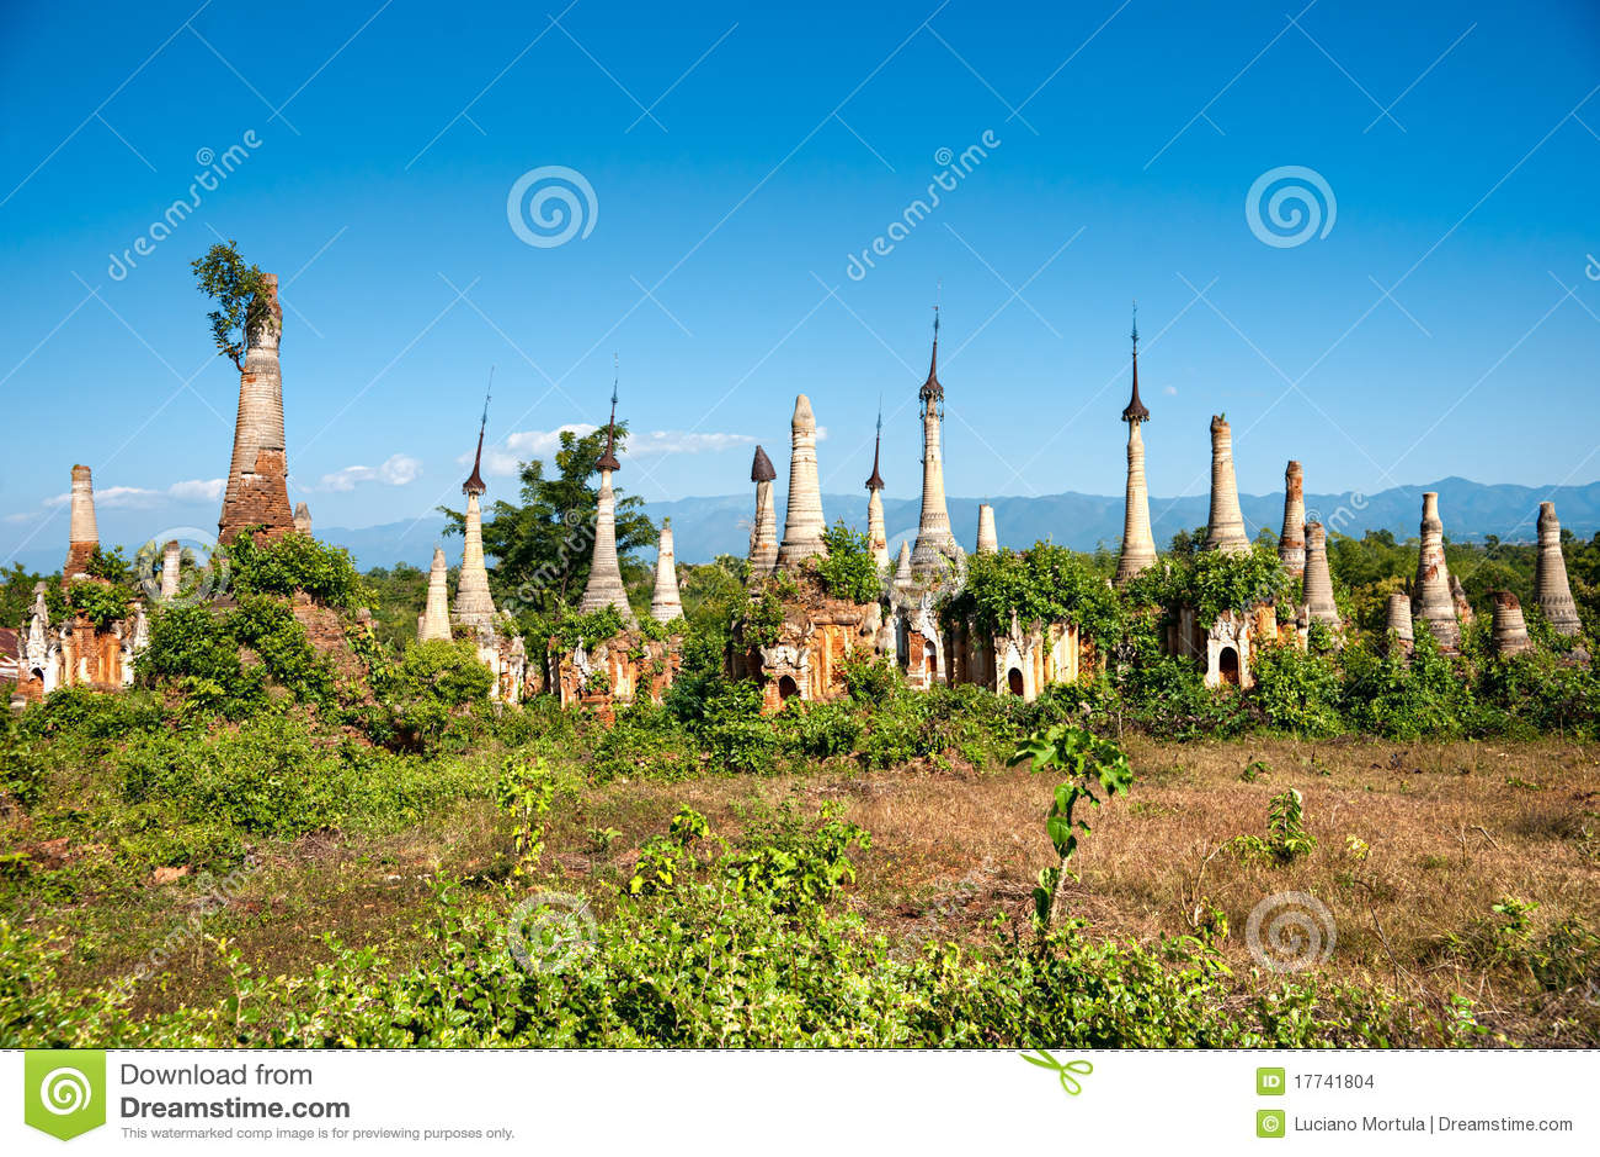 Shwe Indein Pagoda In Inle Lake, Shan State, Myanmar Stock Photo ...